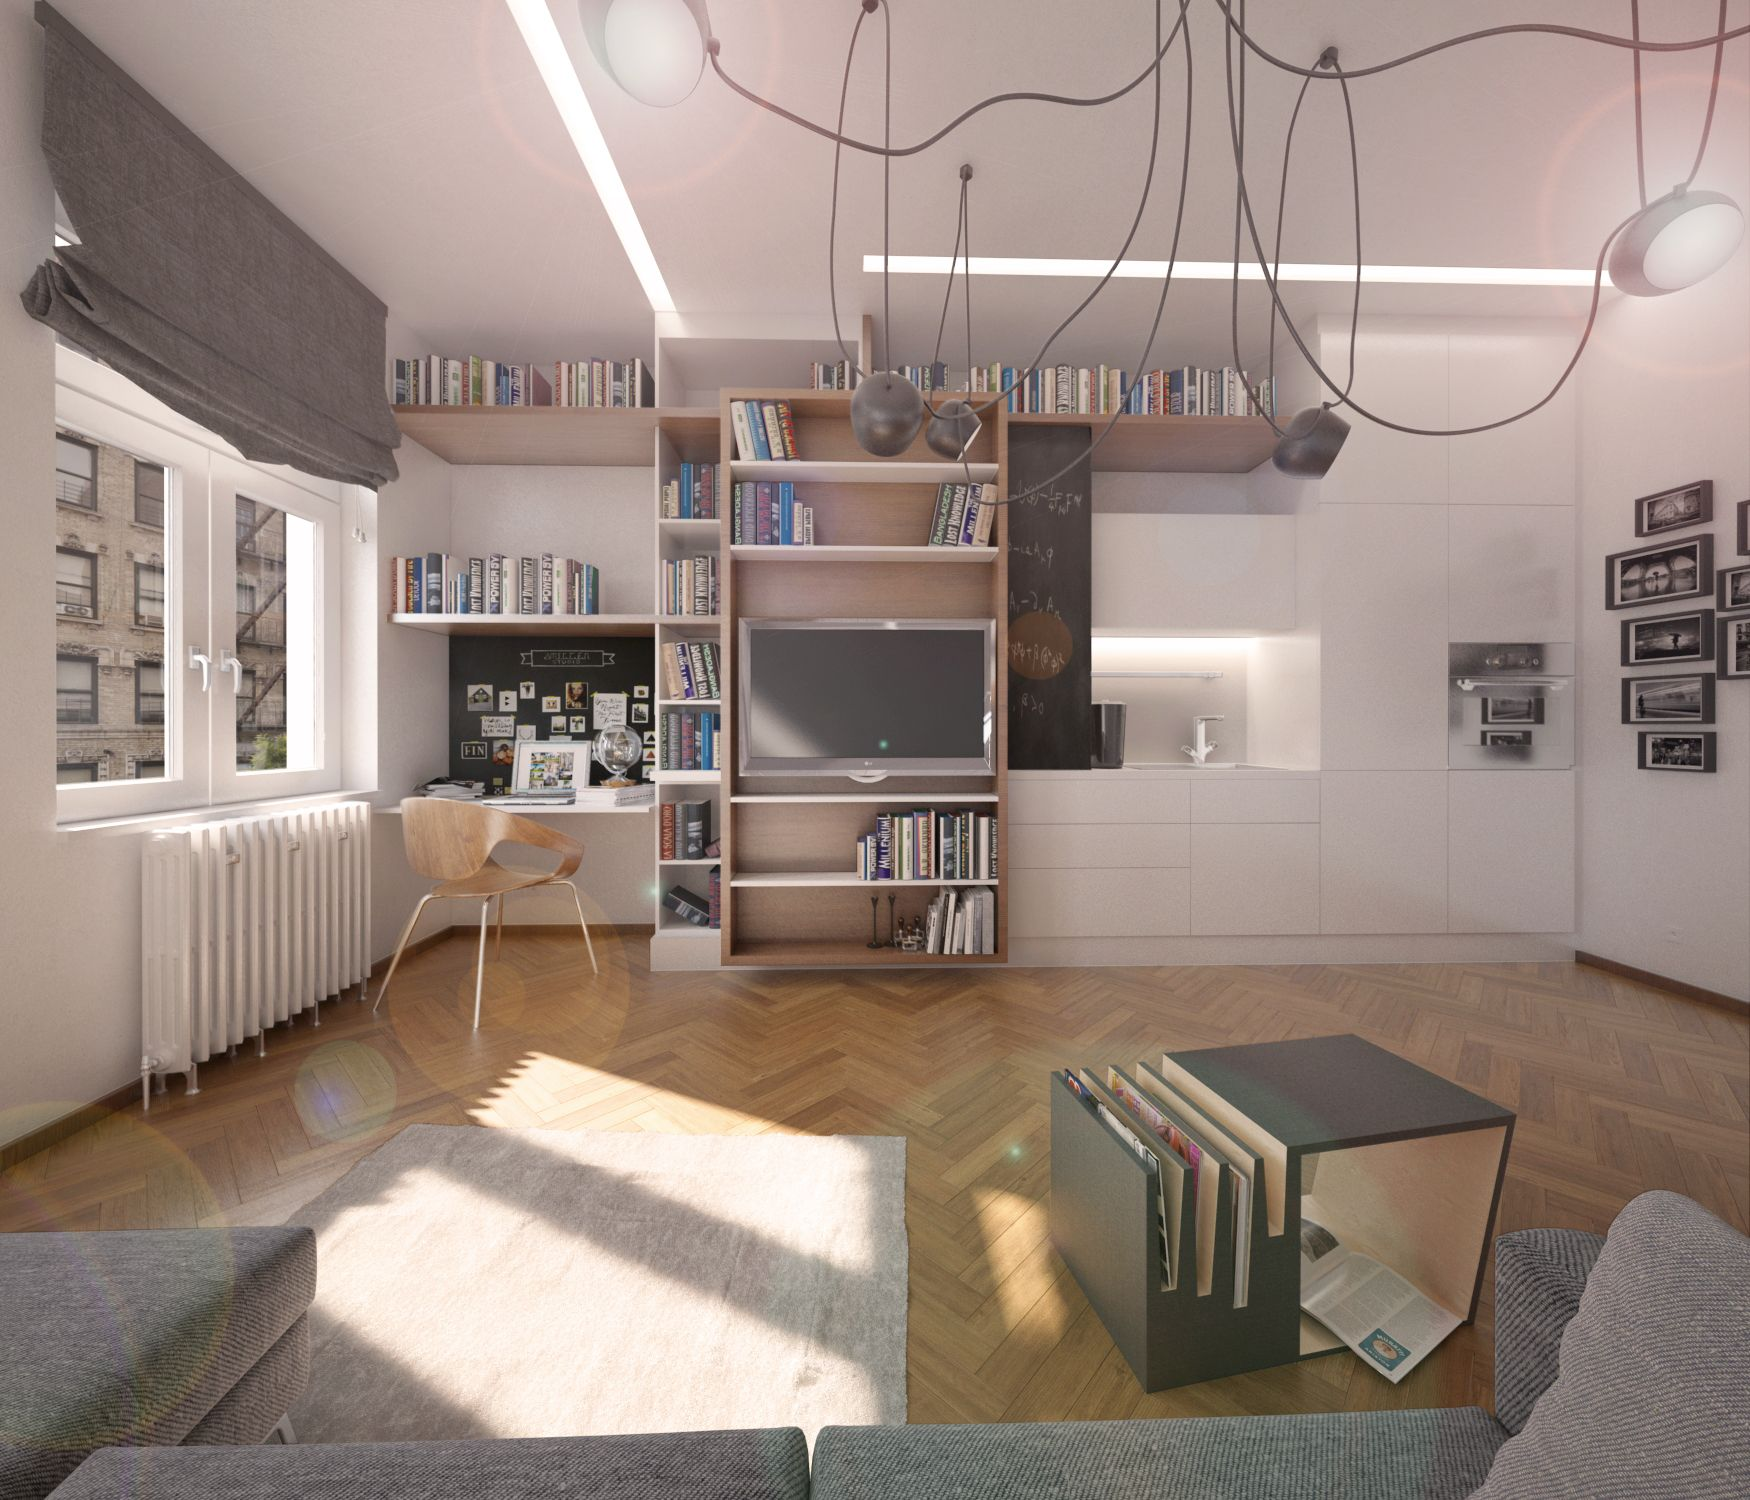 architekt. studie interiéru bytu Praha boq architekti Miroslav Stach Jana Pavelcová